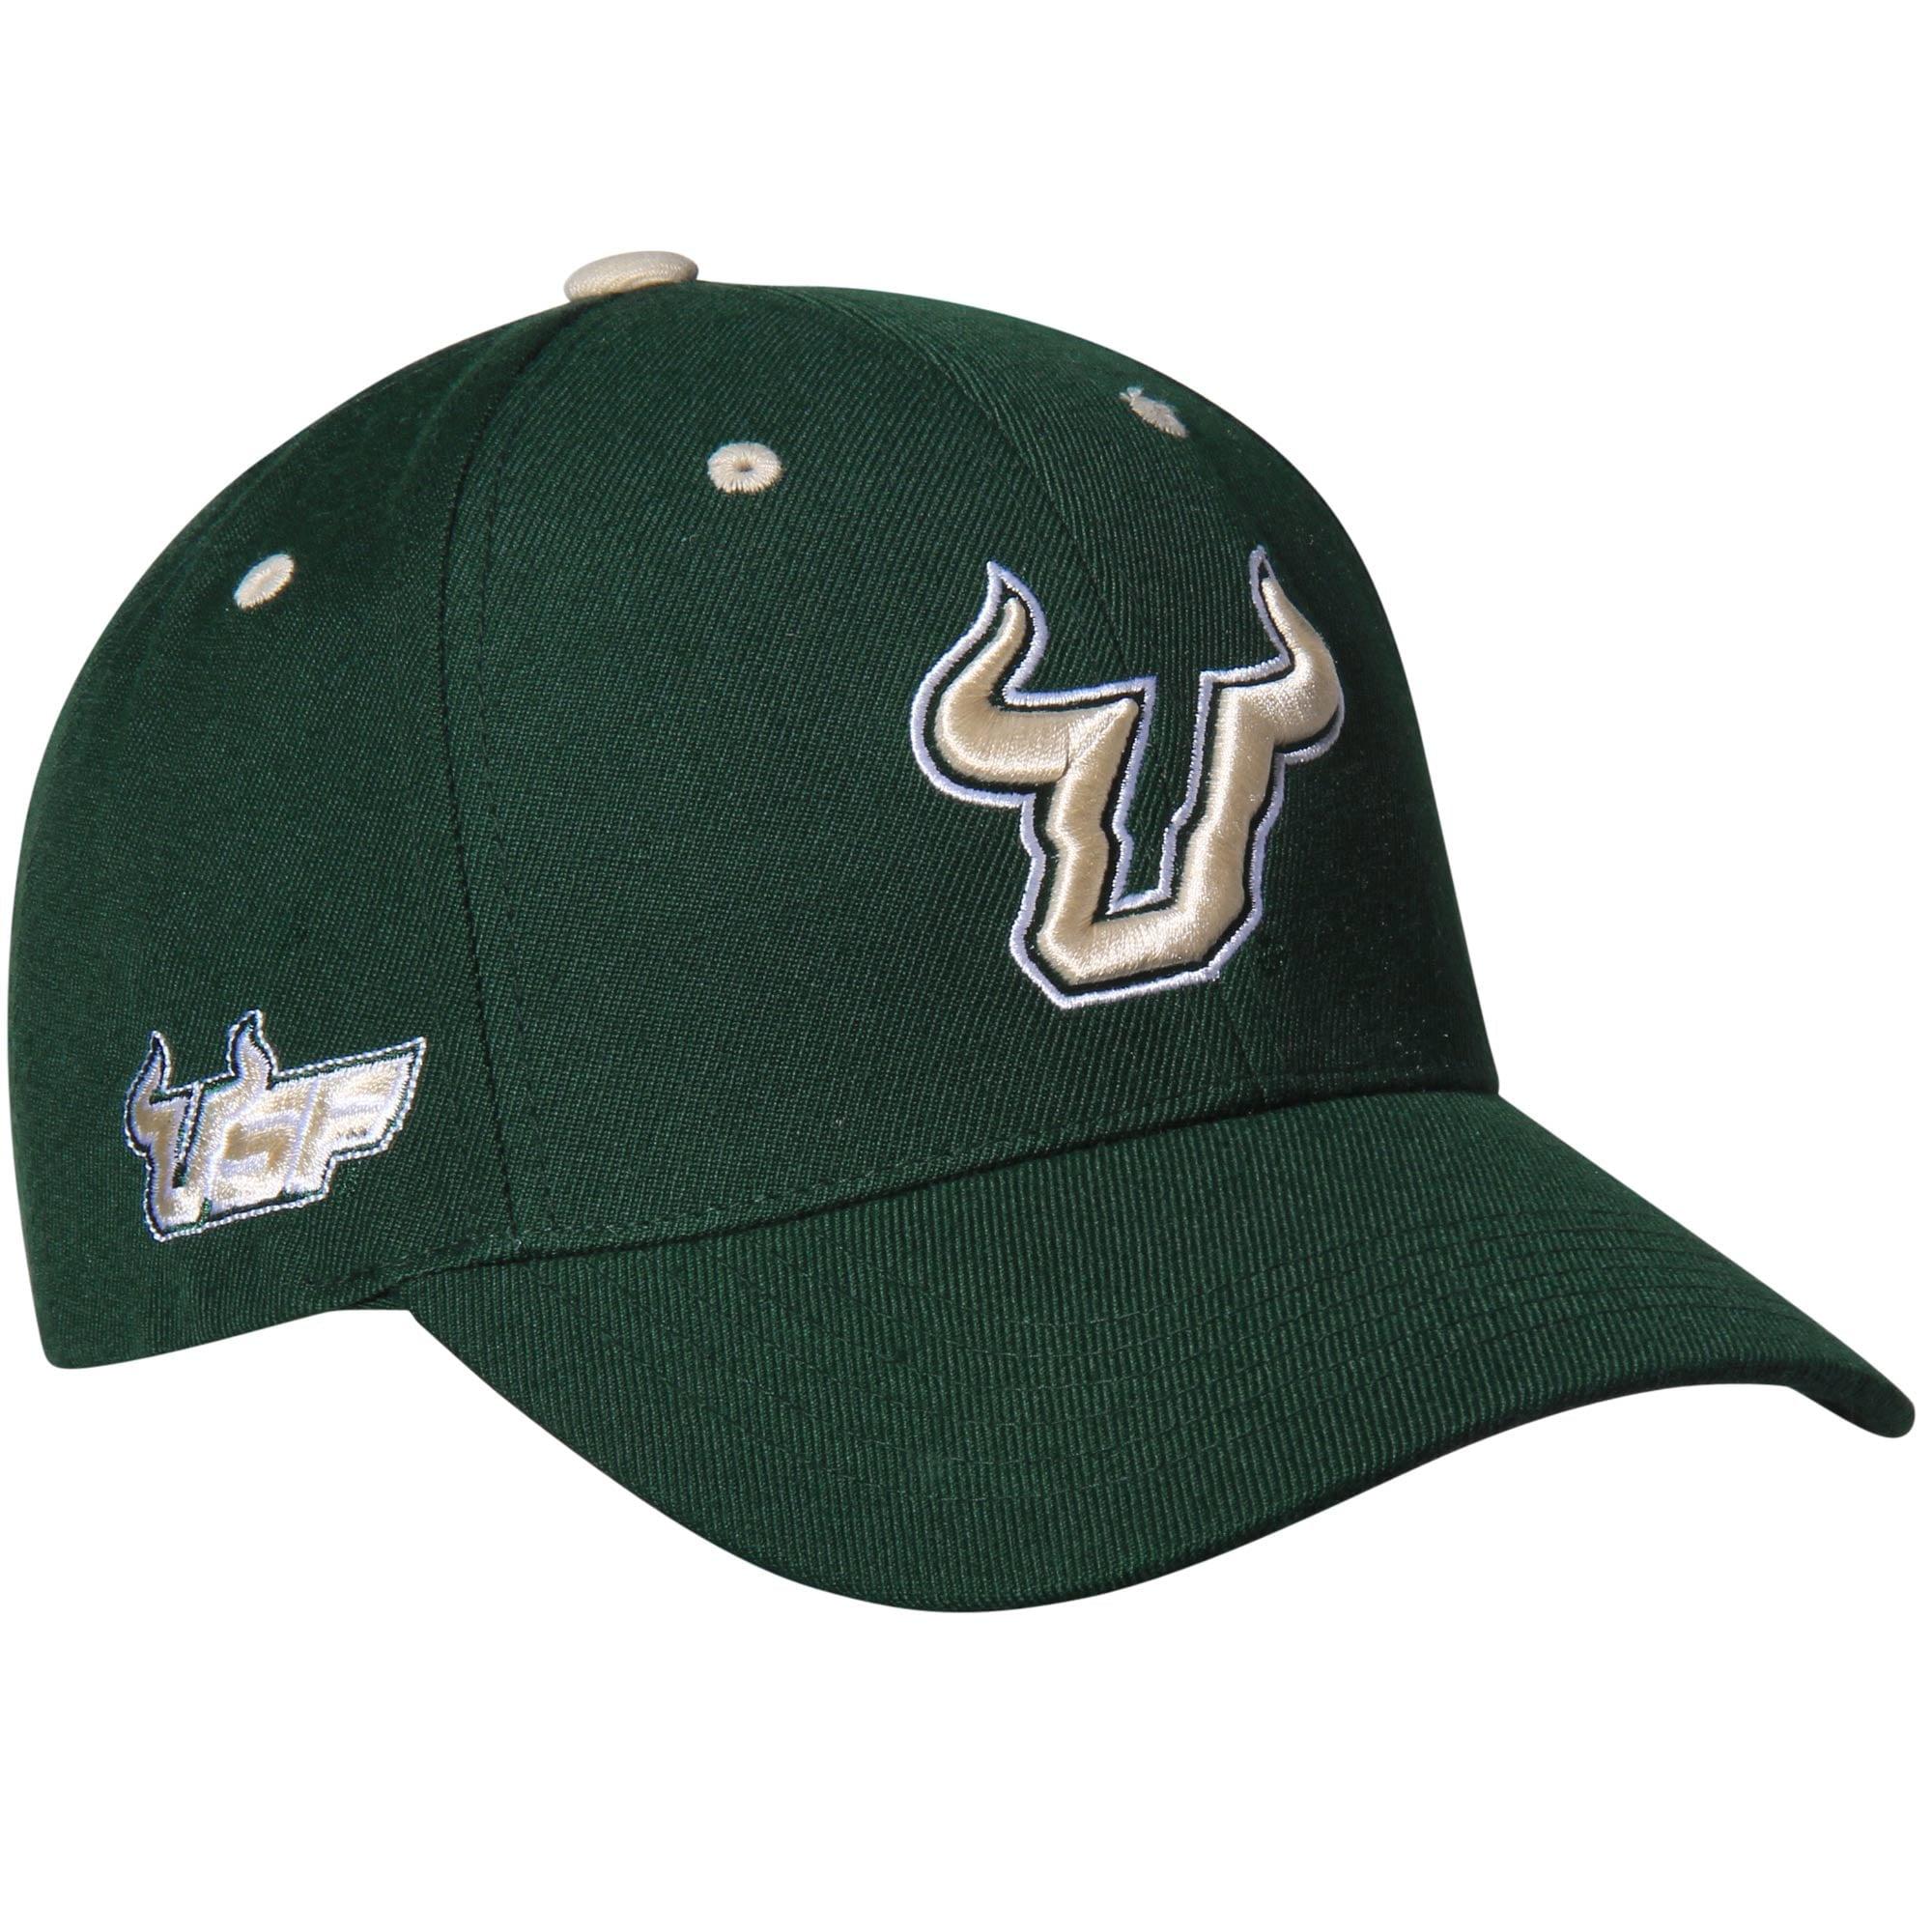 Crystal Mirror Finish Wincraft NCAA South Florida USF Bulls Premium License Plate